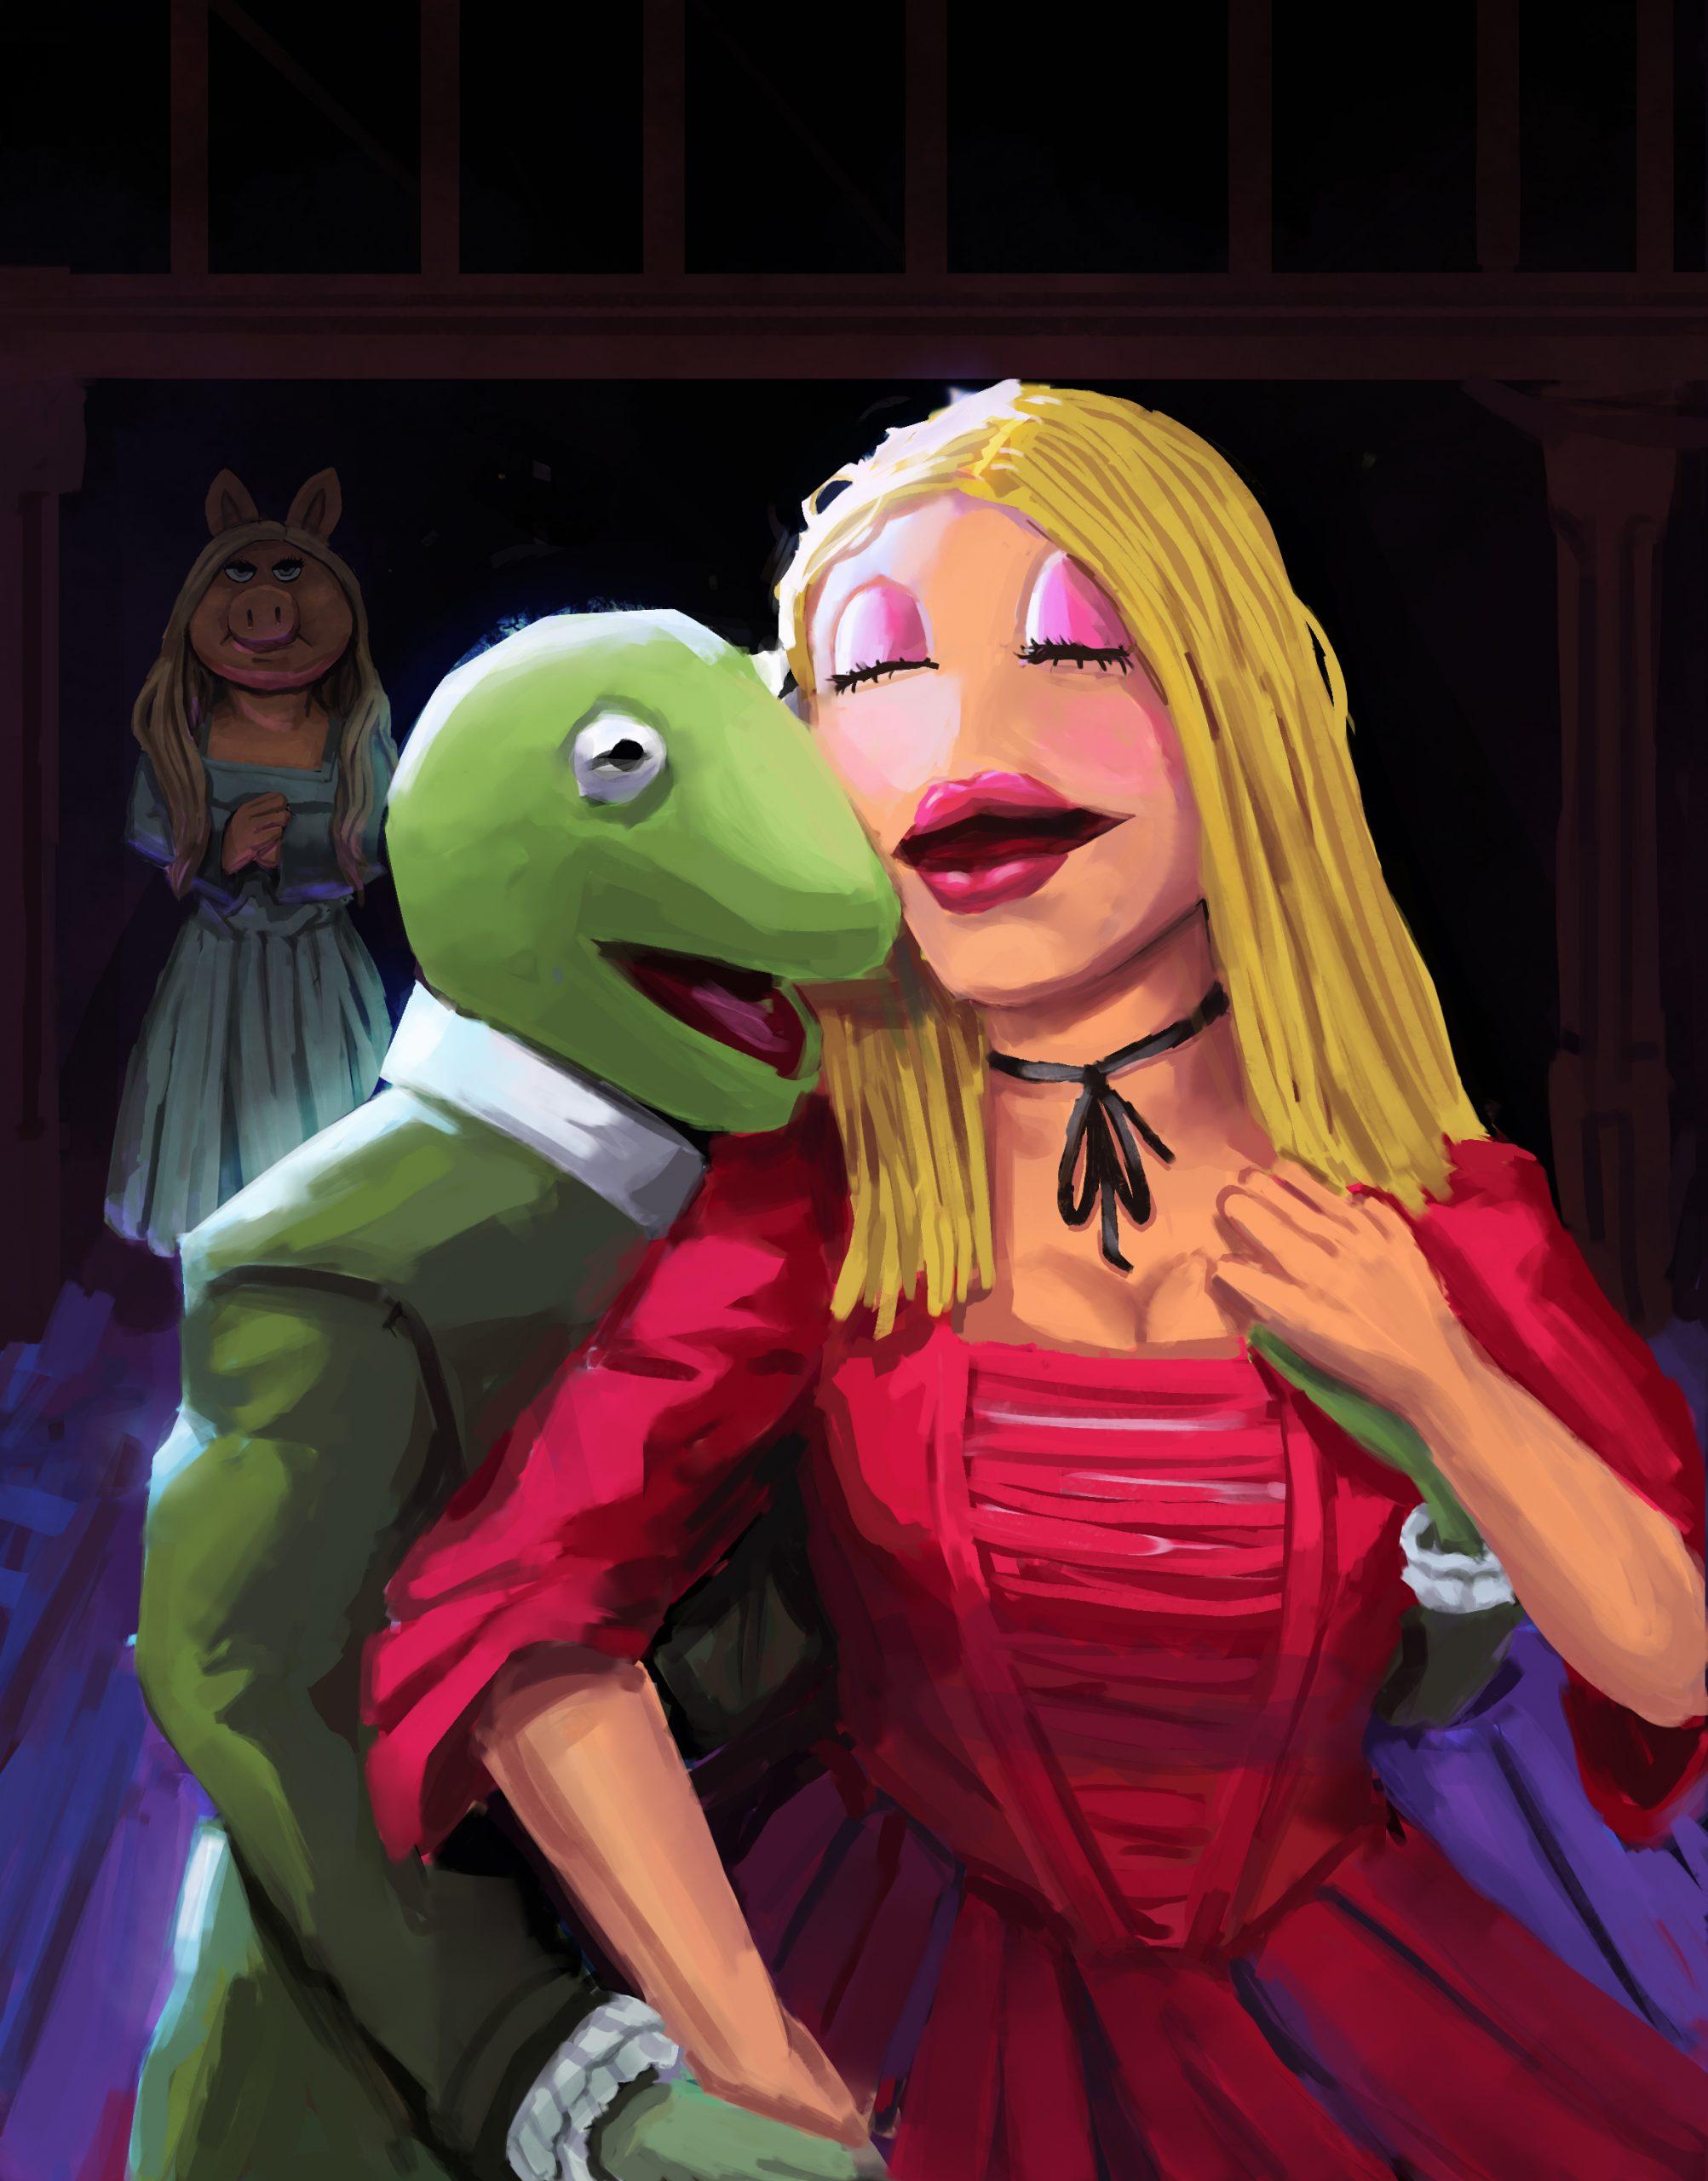 "Muppets in Hamilton, Angel Rodriguez<br>9 x 12""<br>Digital Illustration<br>"